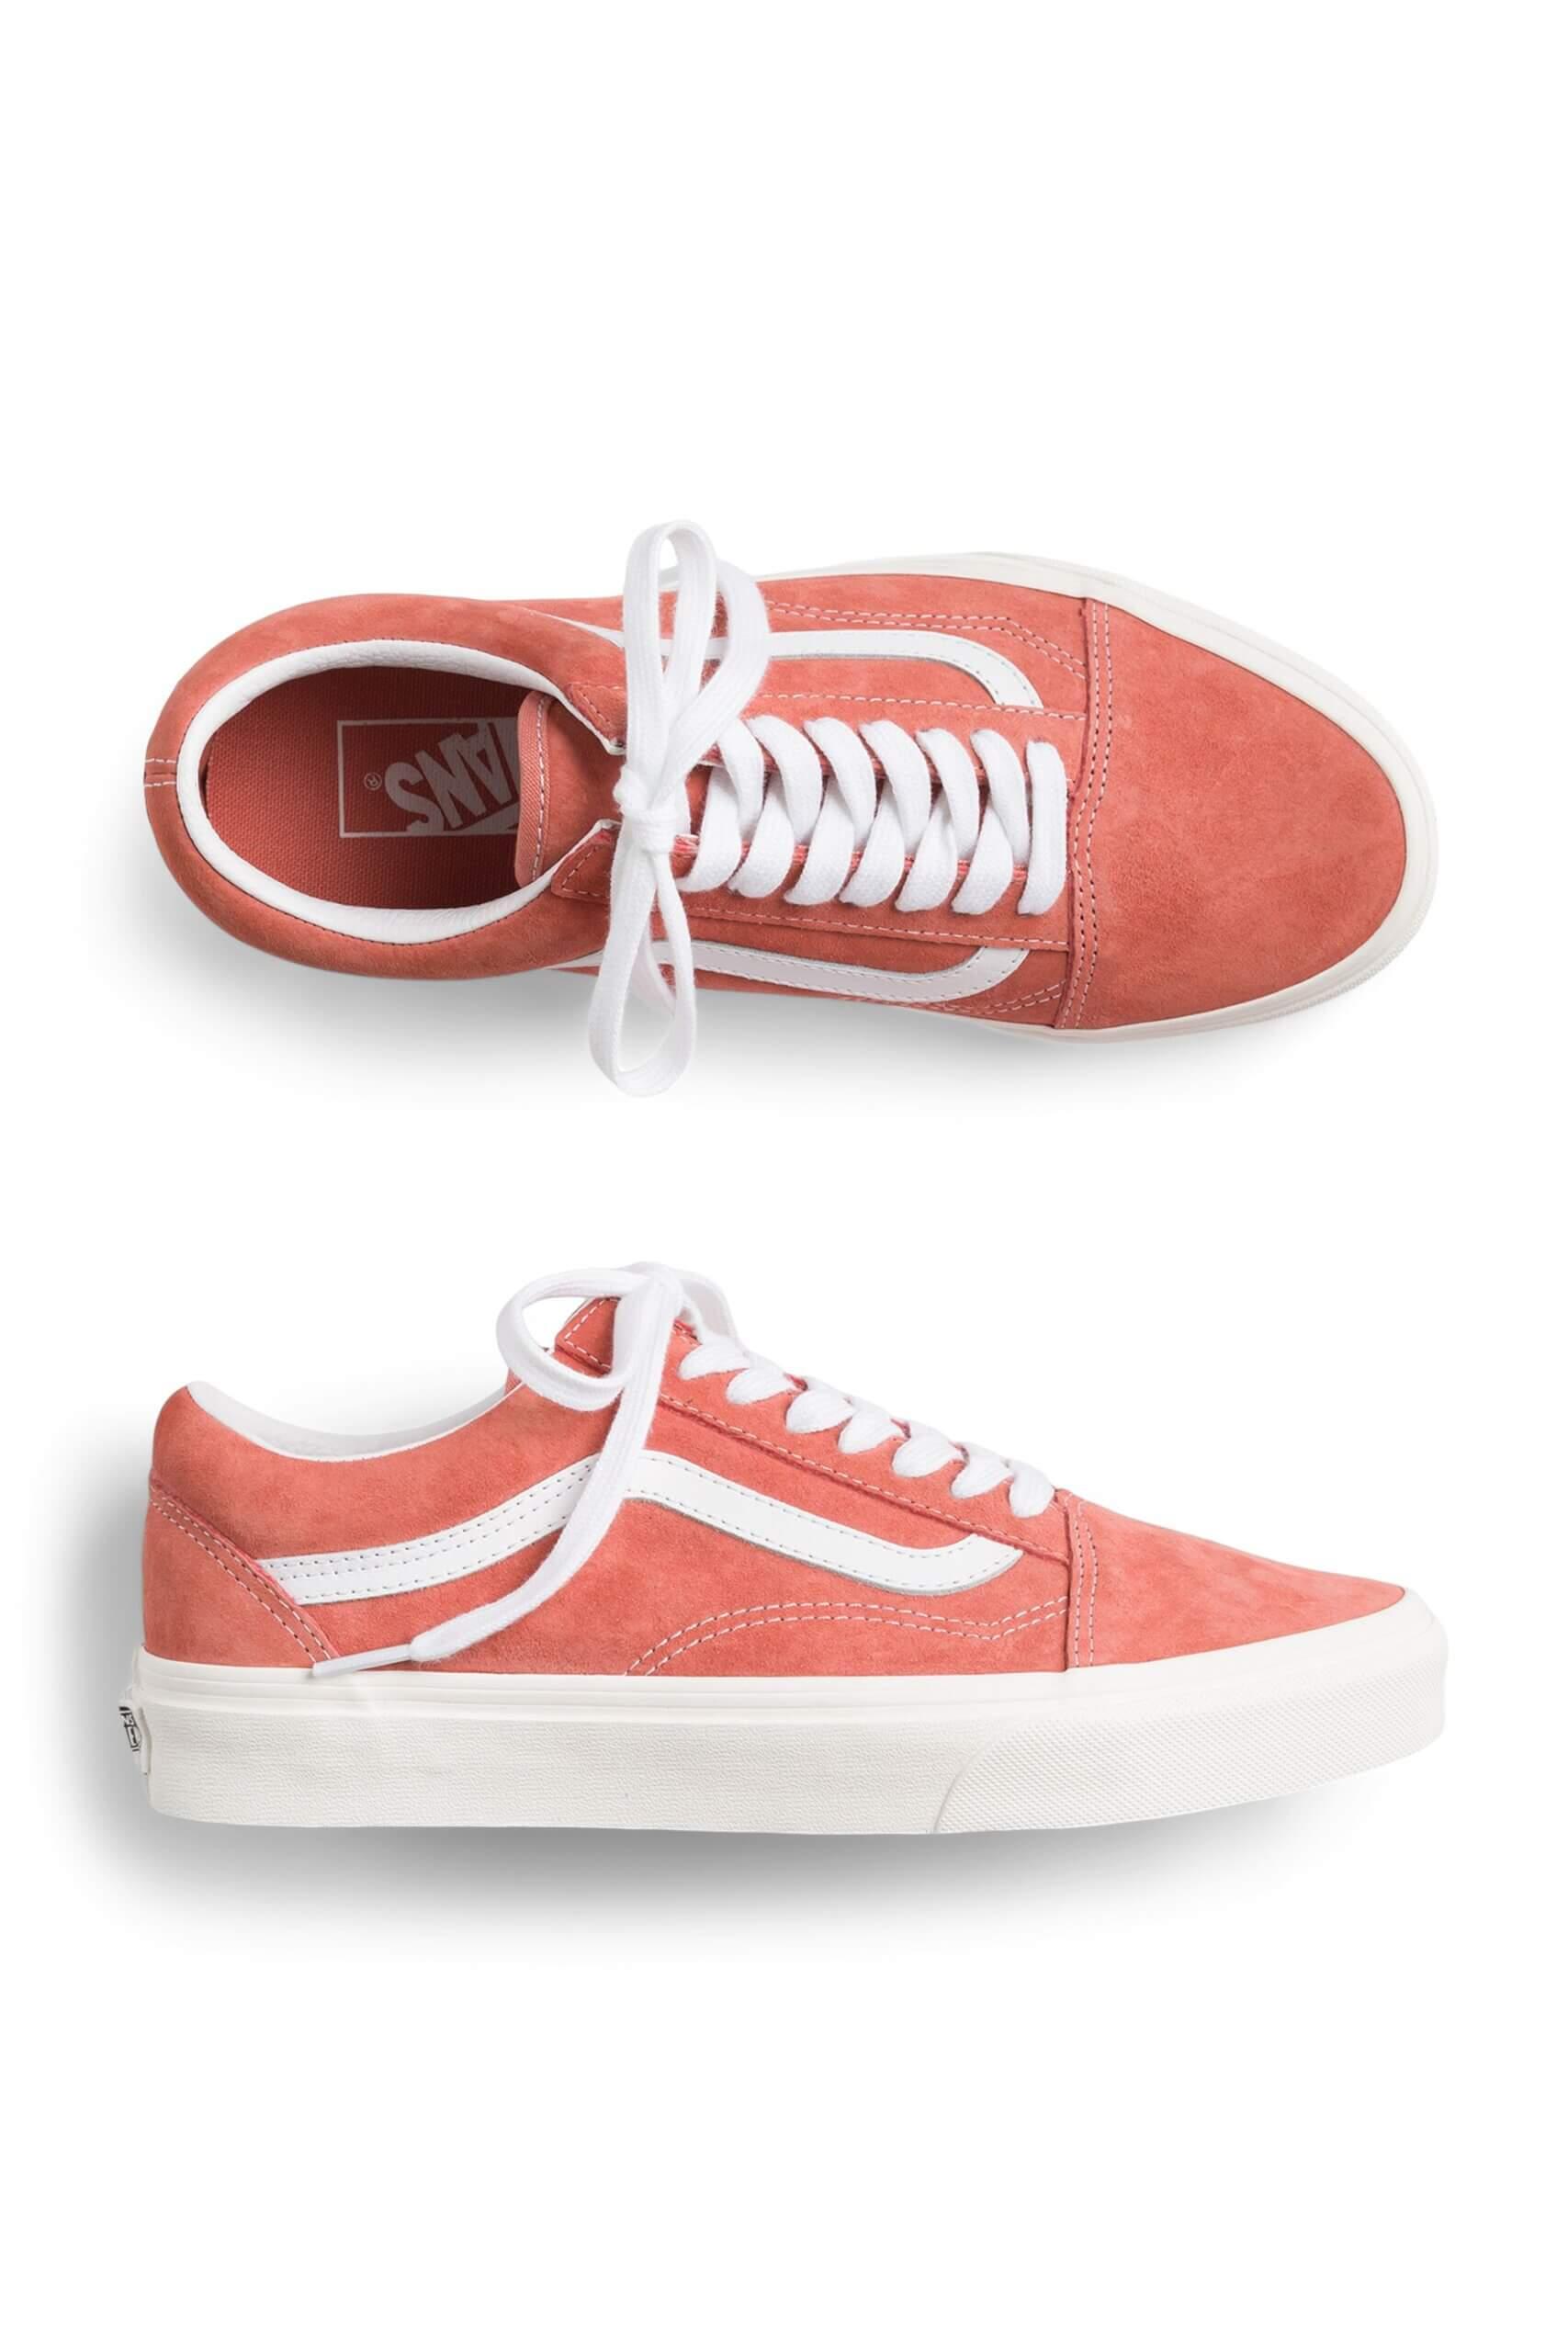 Stitch Fix Women's pink sneakers.